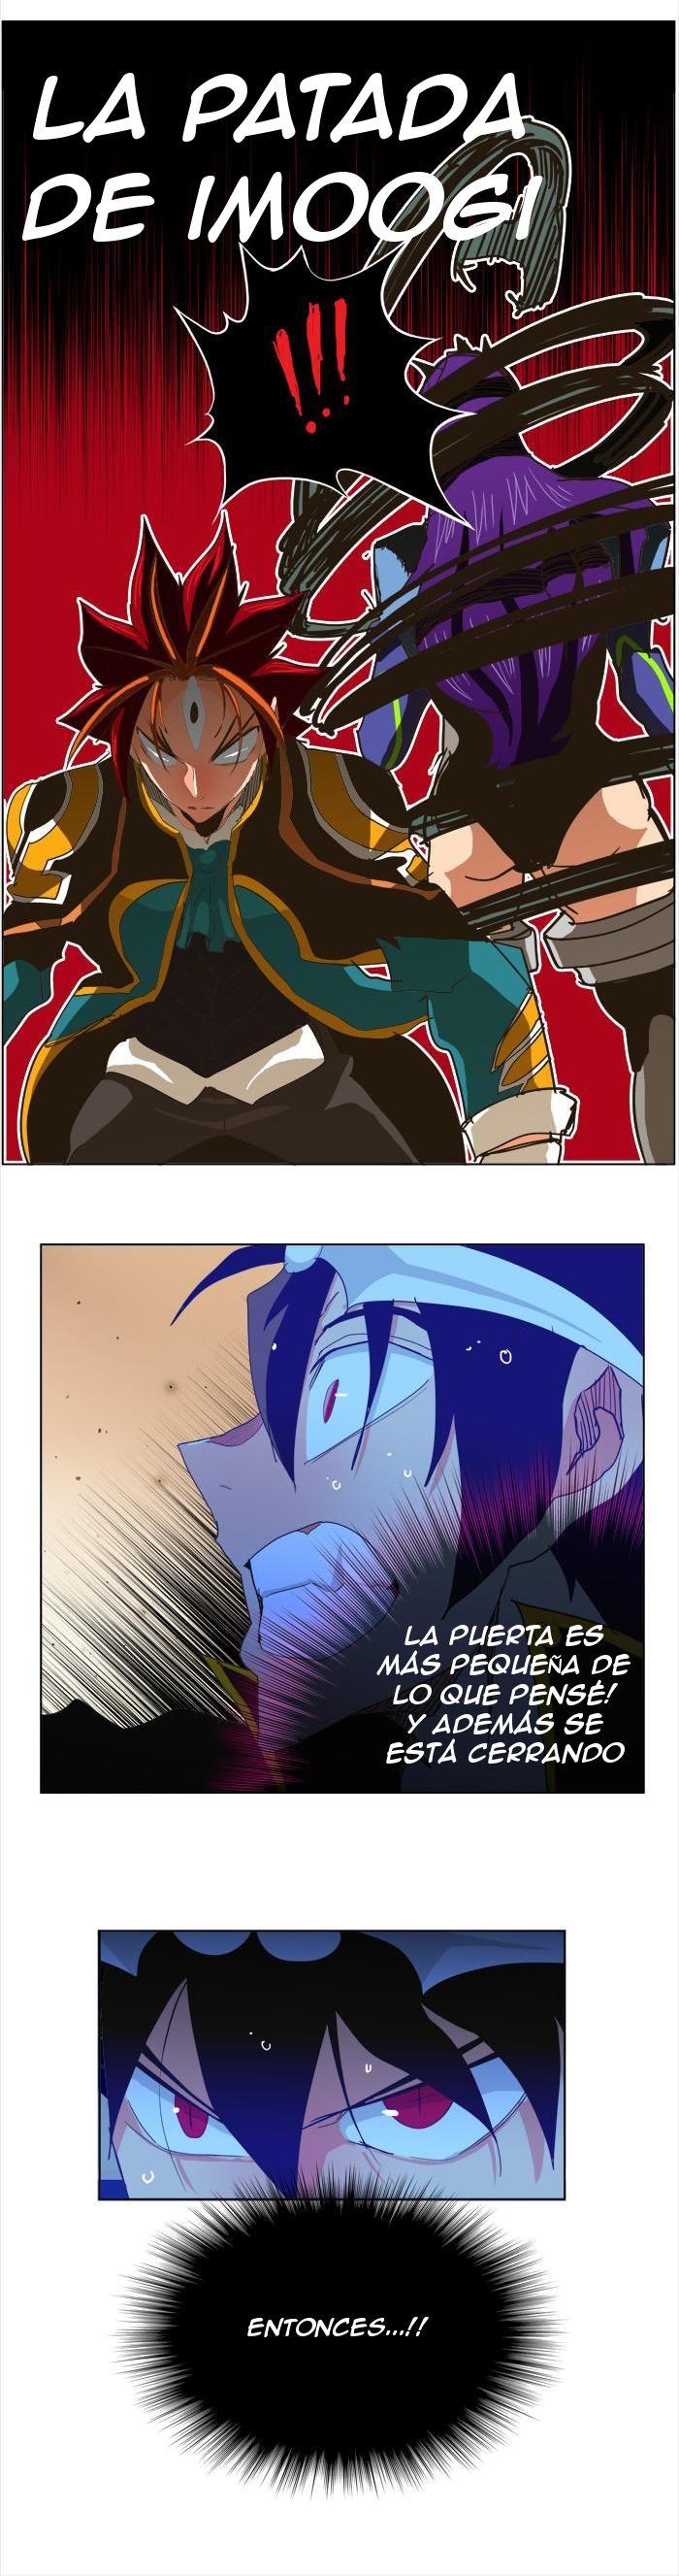 http://c5.ninemanga.com/es_manga/37/485/483914/eb7809549ba835e16881e0285a68c145.jpg Page 3